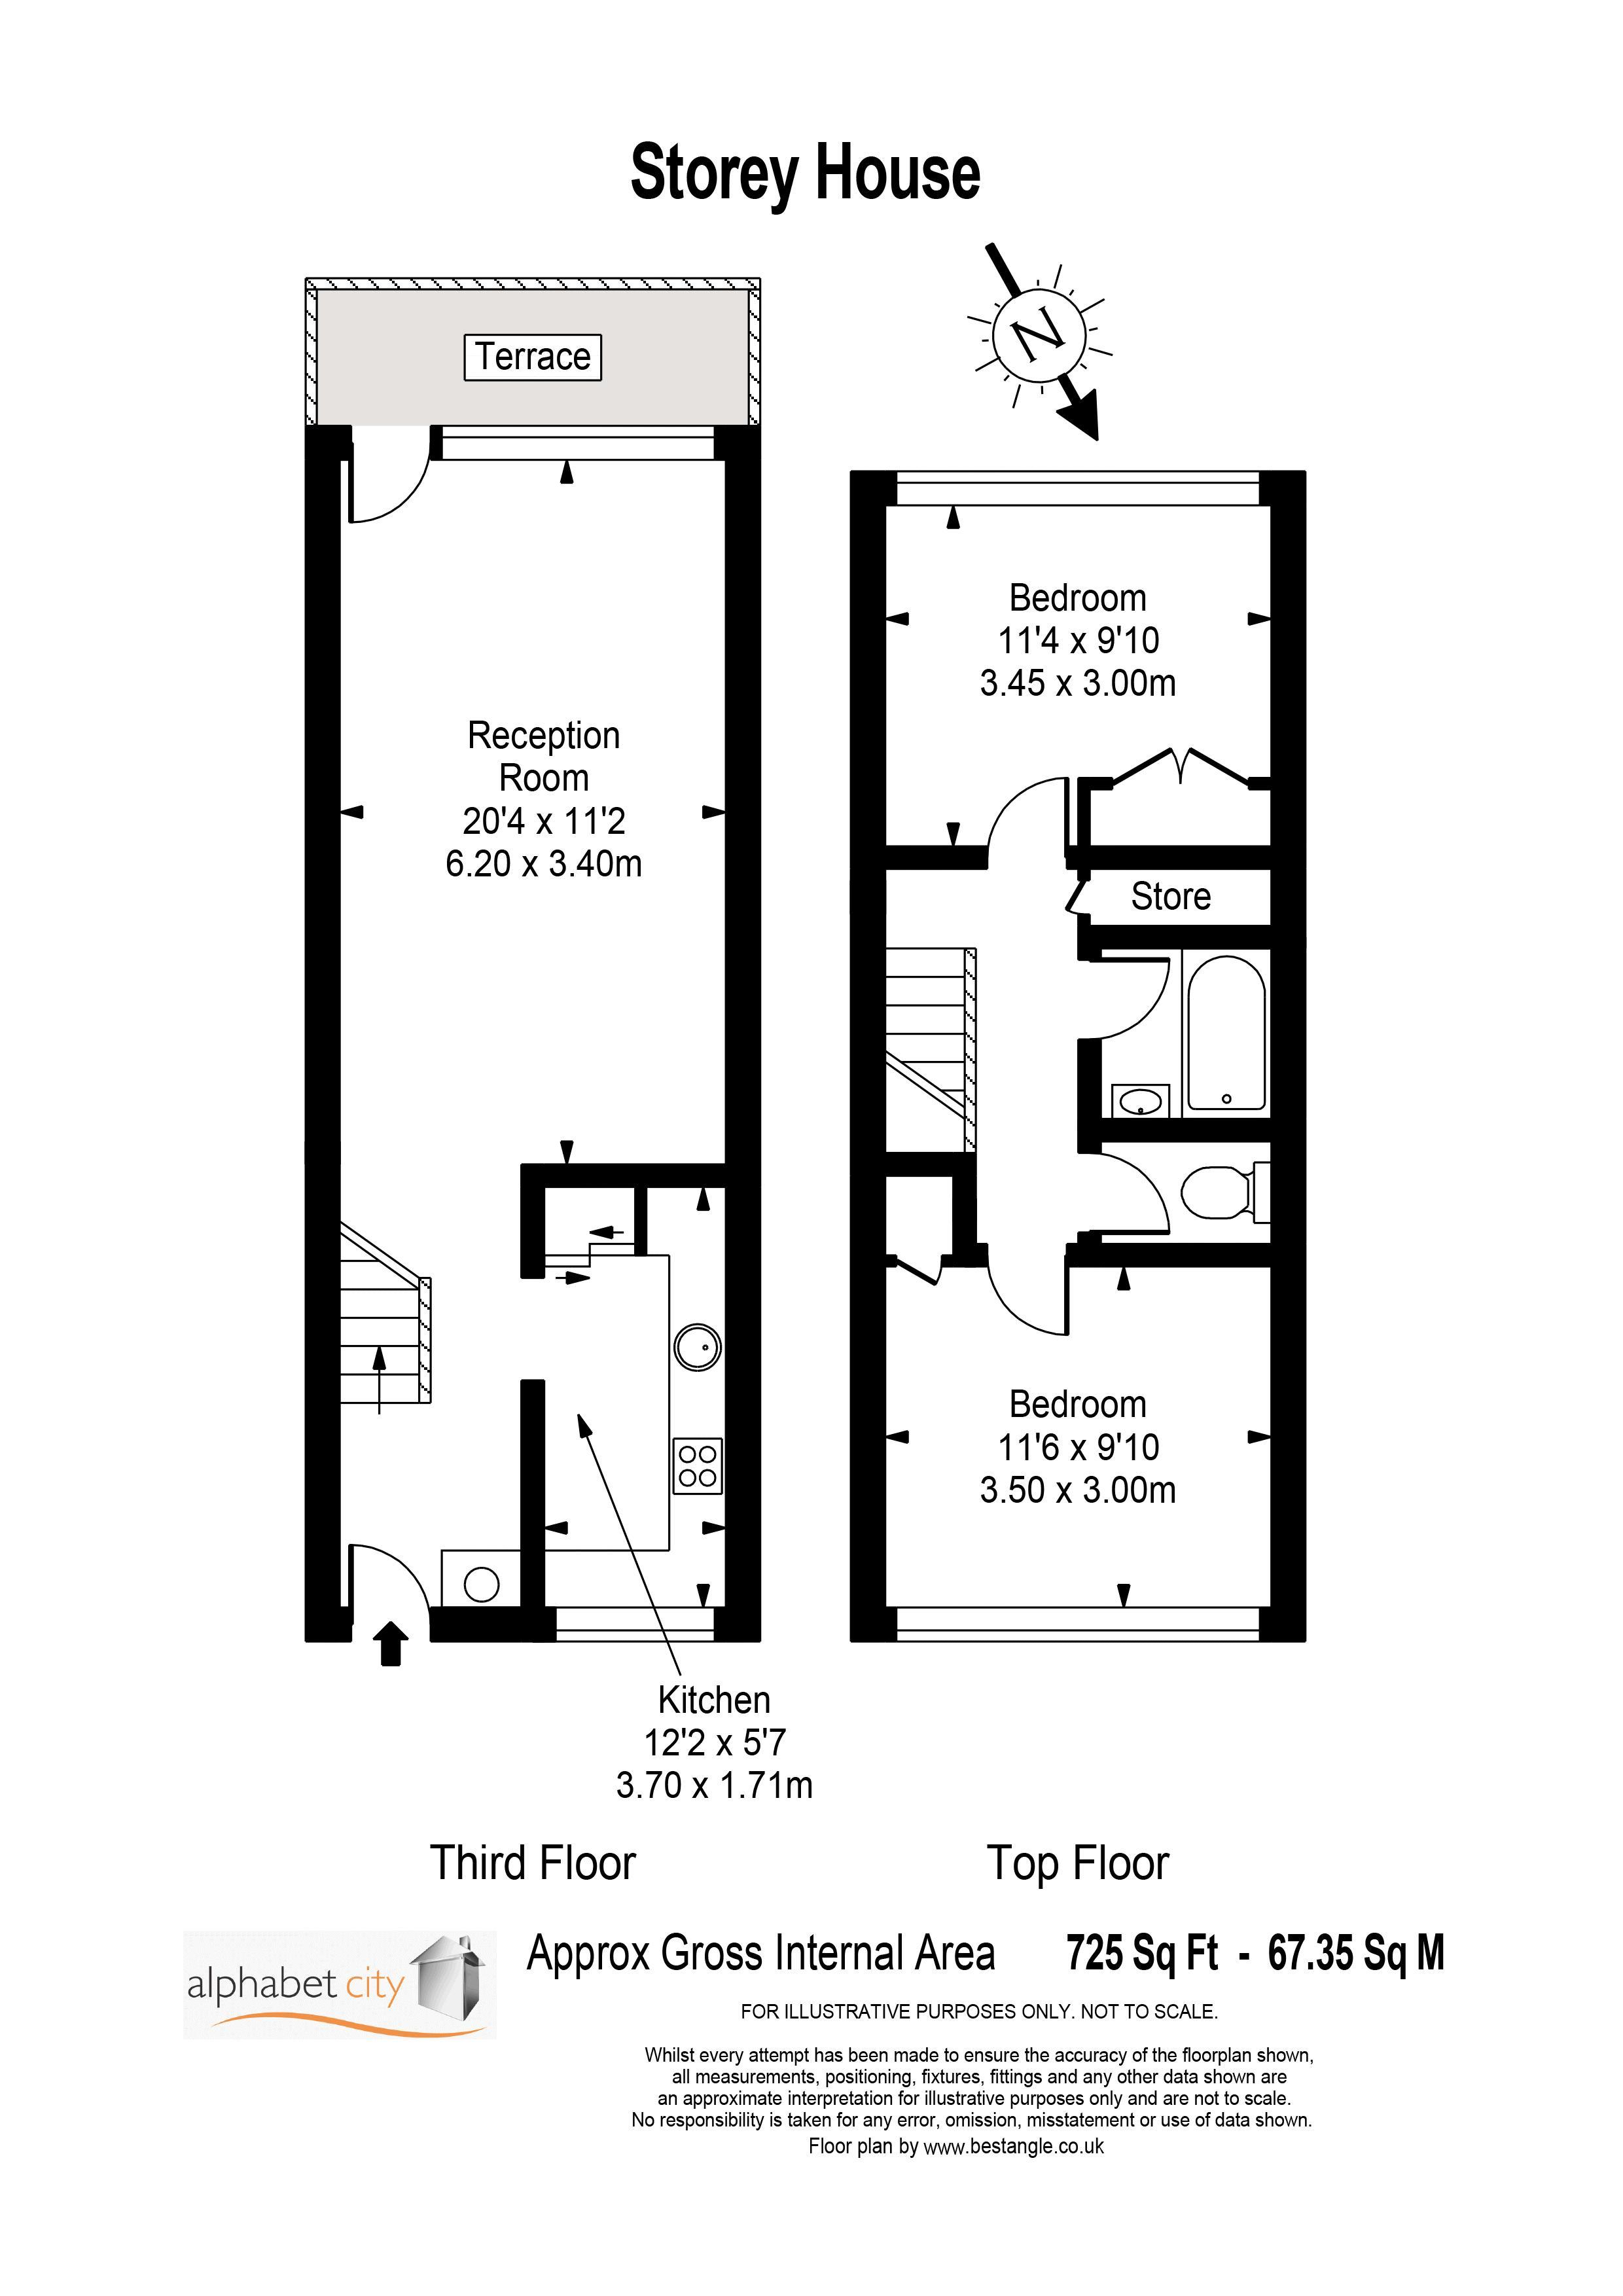 Storey House Floor Plan